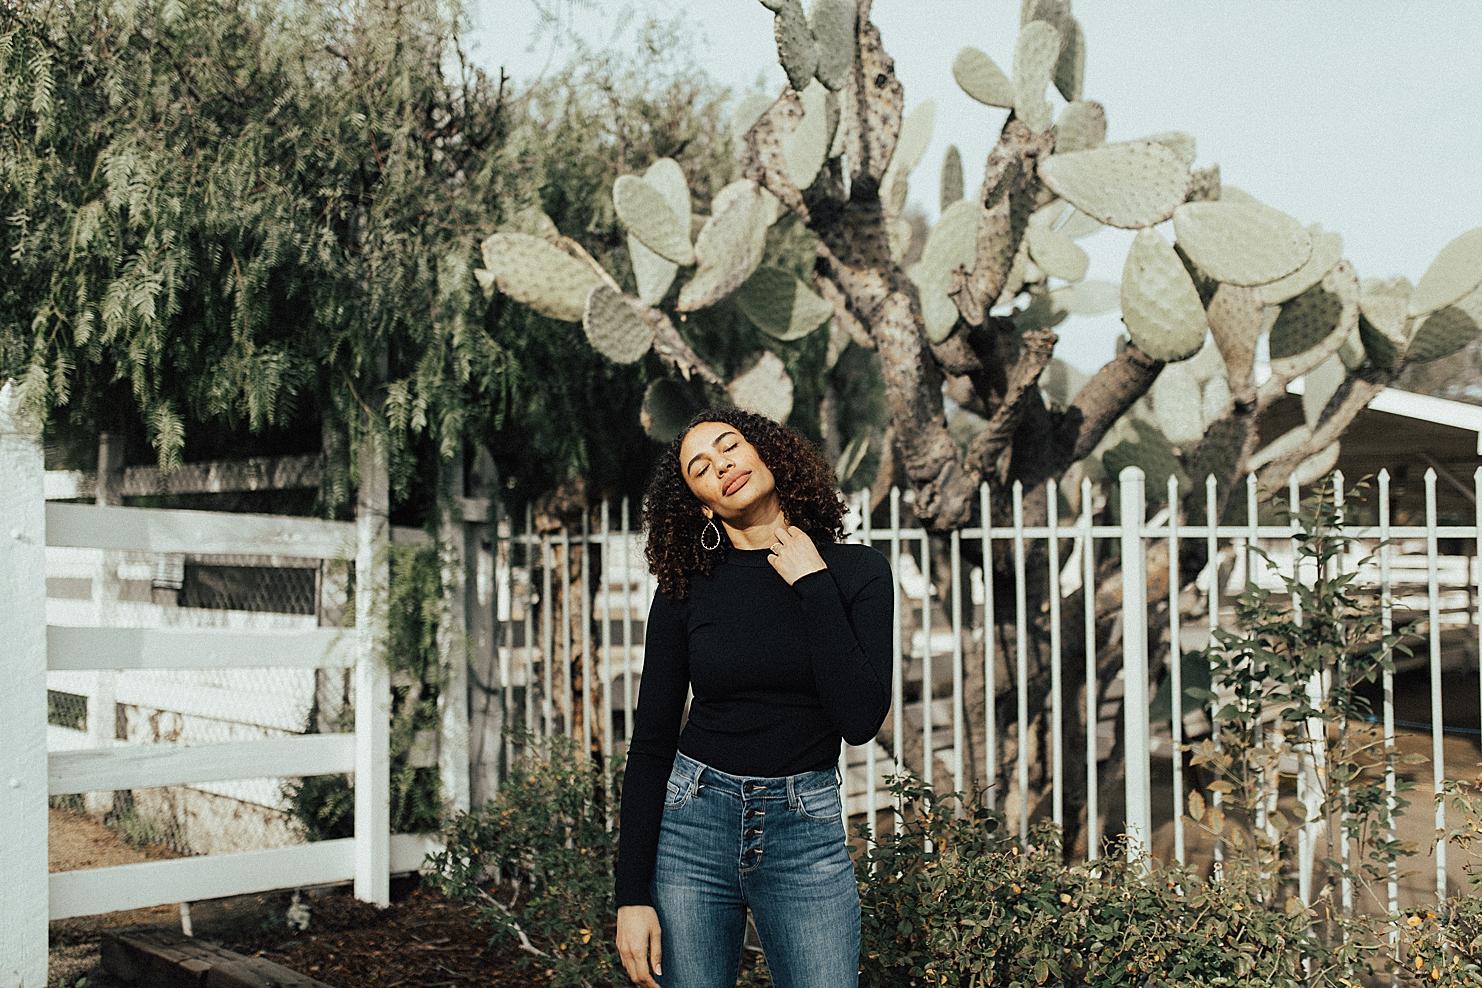 CJLA Carly Jean Los Angeles Fashion Photographer Rachel Wakefield Calabasas Lifestyle Shoot-339.jpg